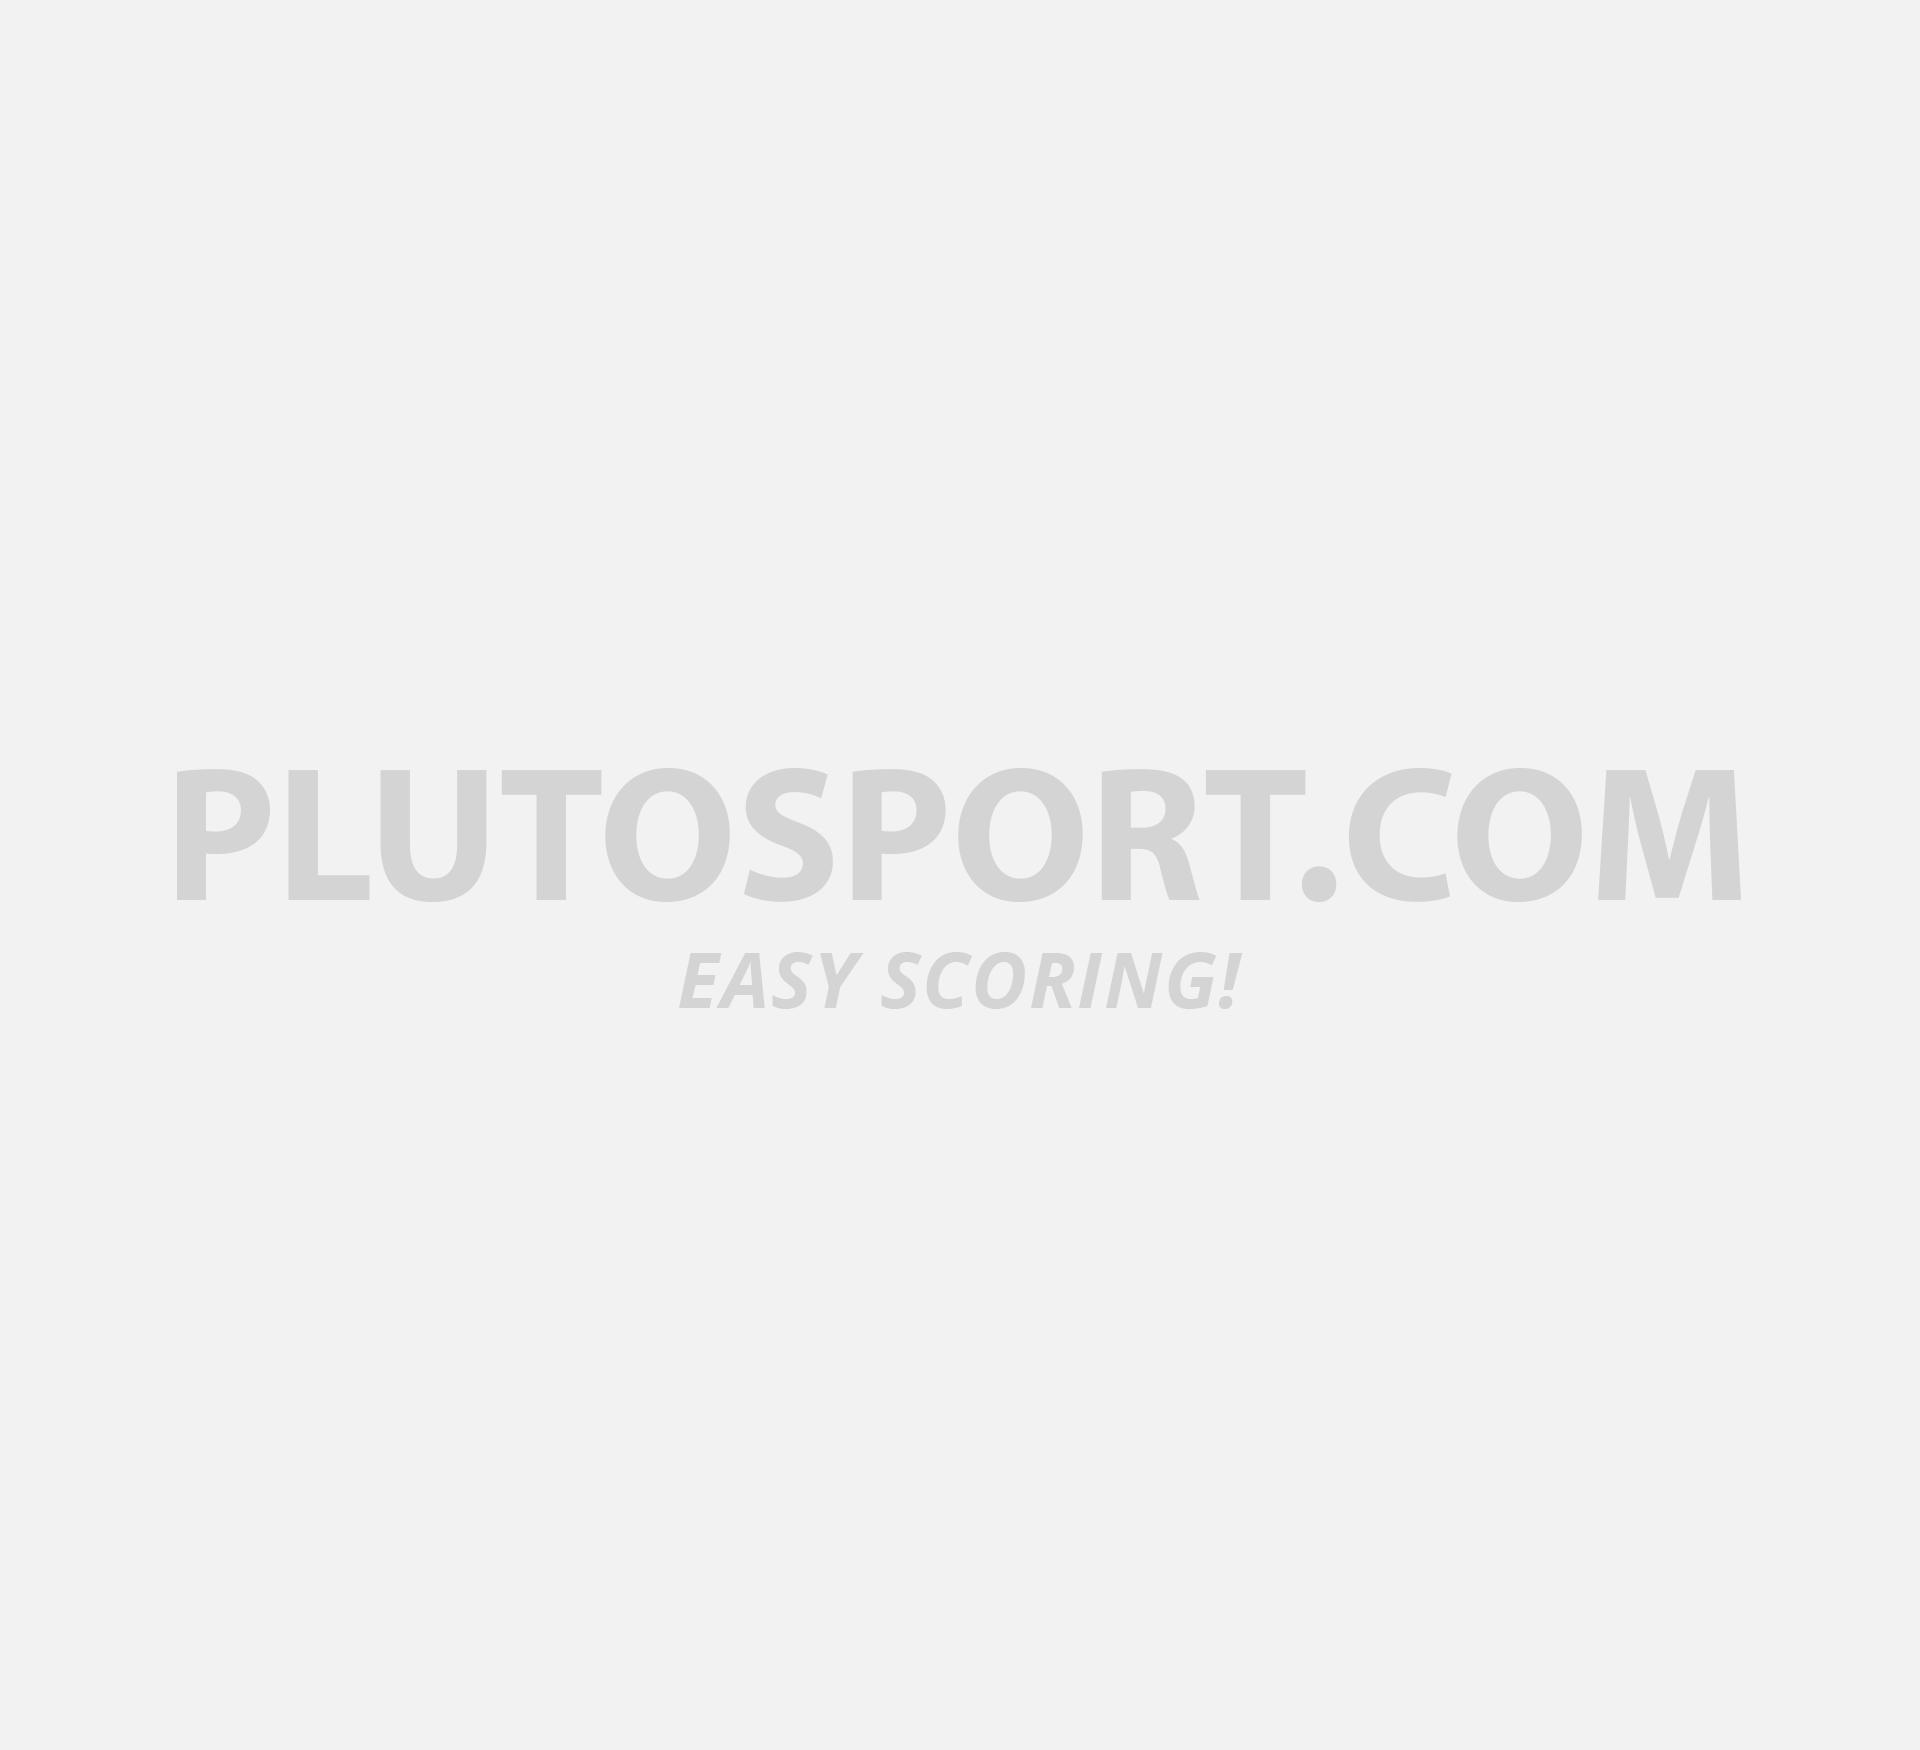 Columbia Ventfreak Outdry - Low Shoes - Shoes - Outdoor - Sports | Plutosport